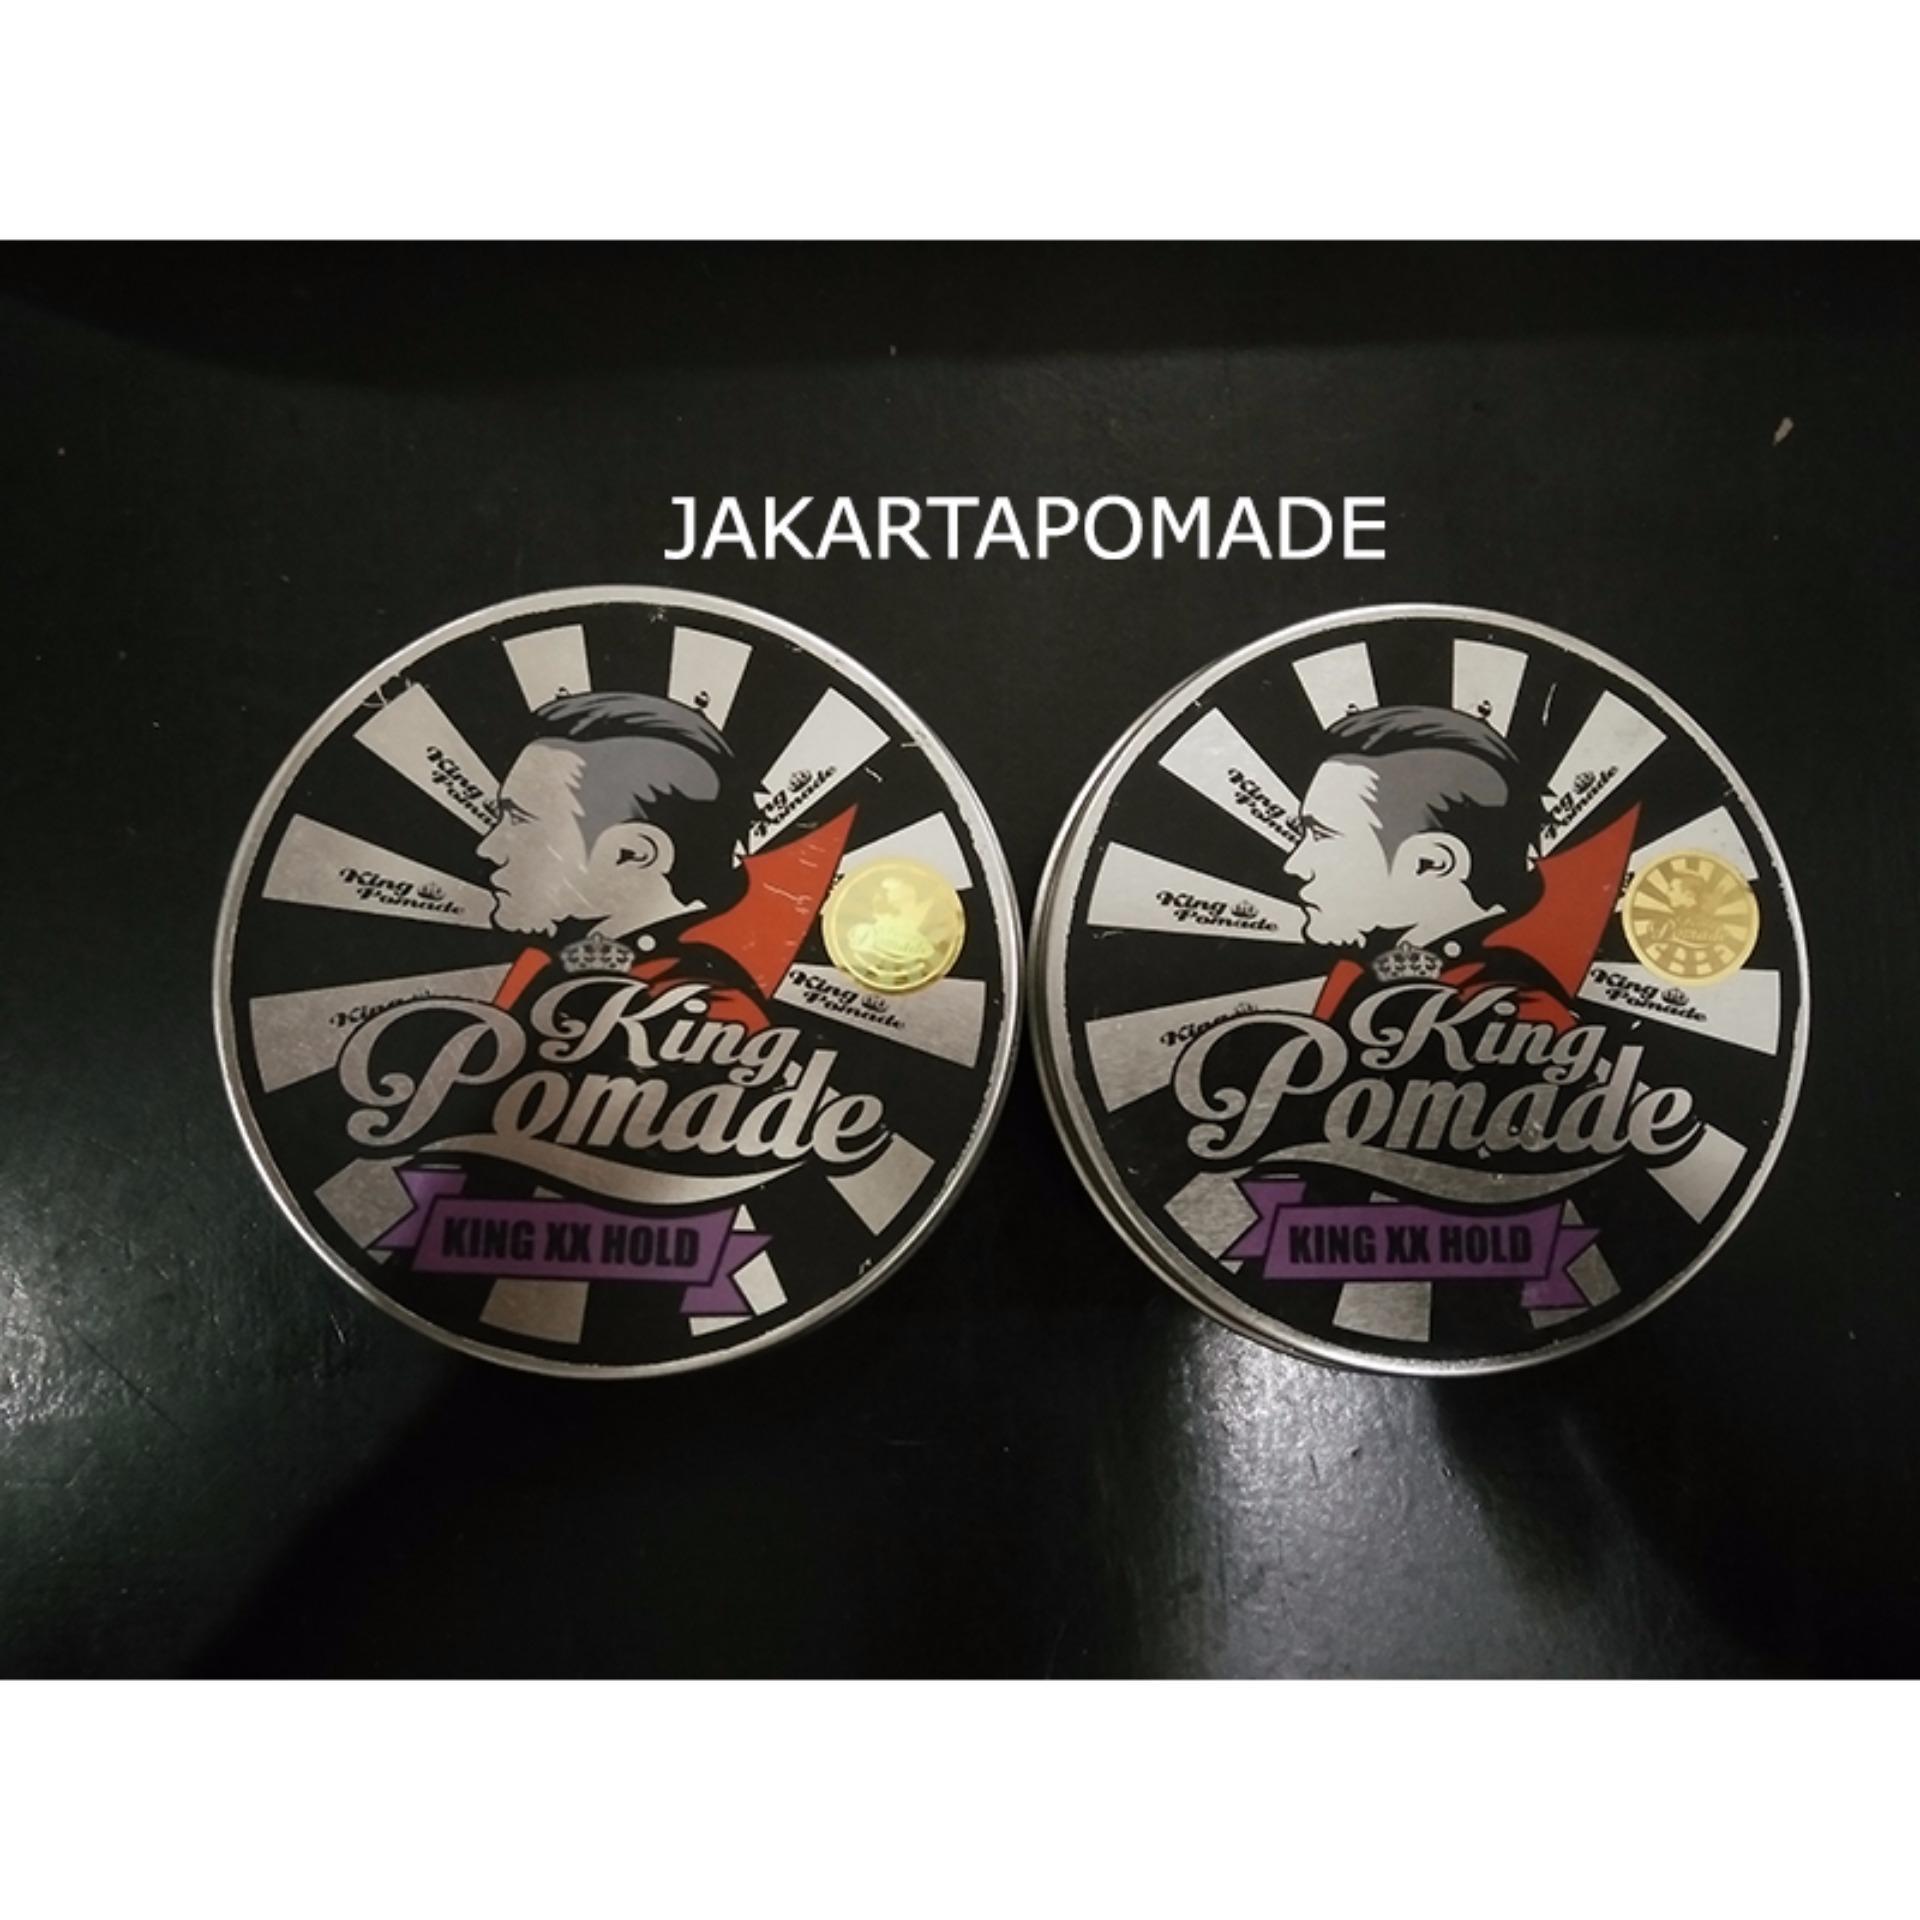 King Pomade Xx Hold 2 8oz Free Sisir Daftar Harga Terlengkap Indonesia Shantos Romeo Classic Oilbased Oil Based Saku Hair Wax Minyak Rambut 28oz Home